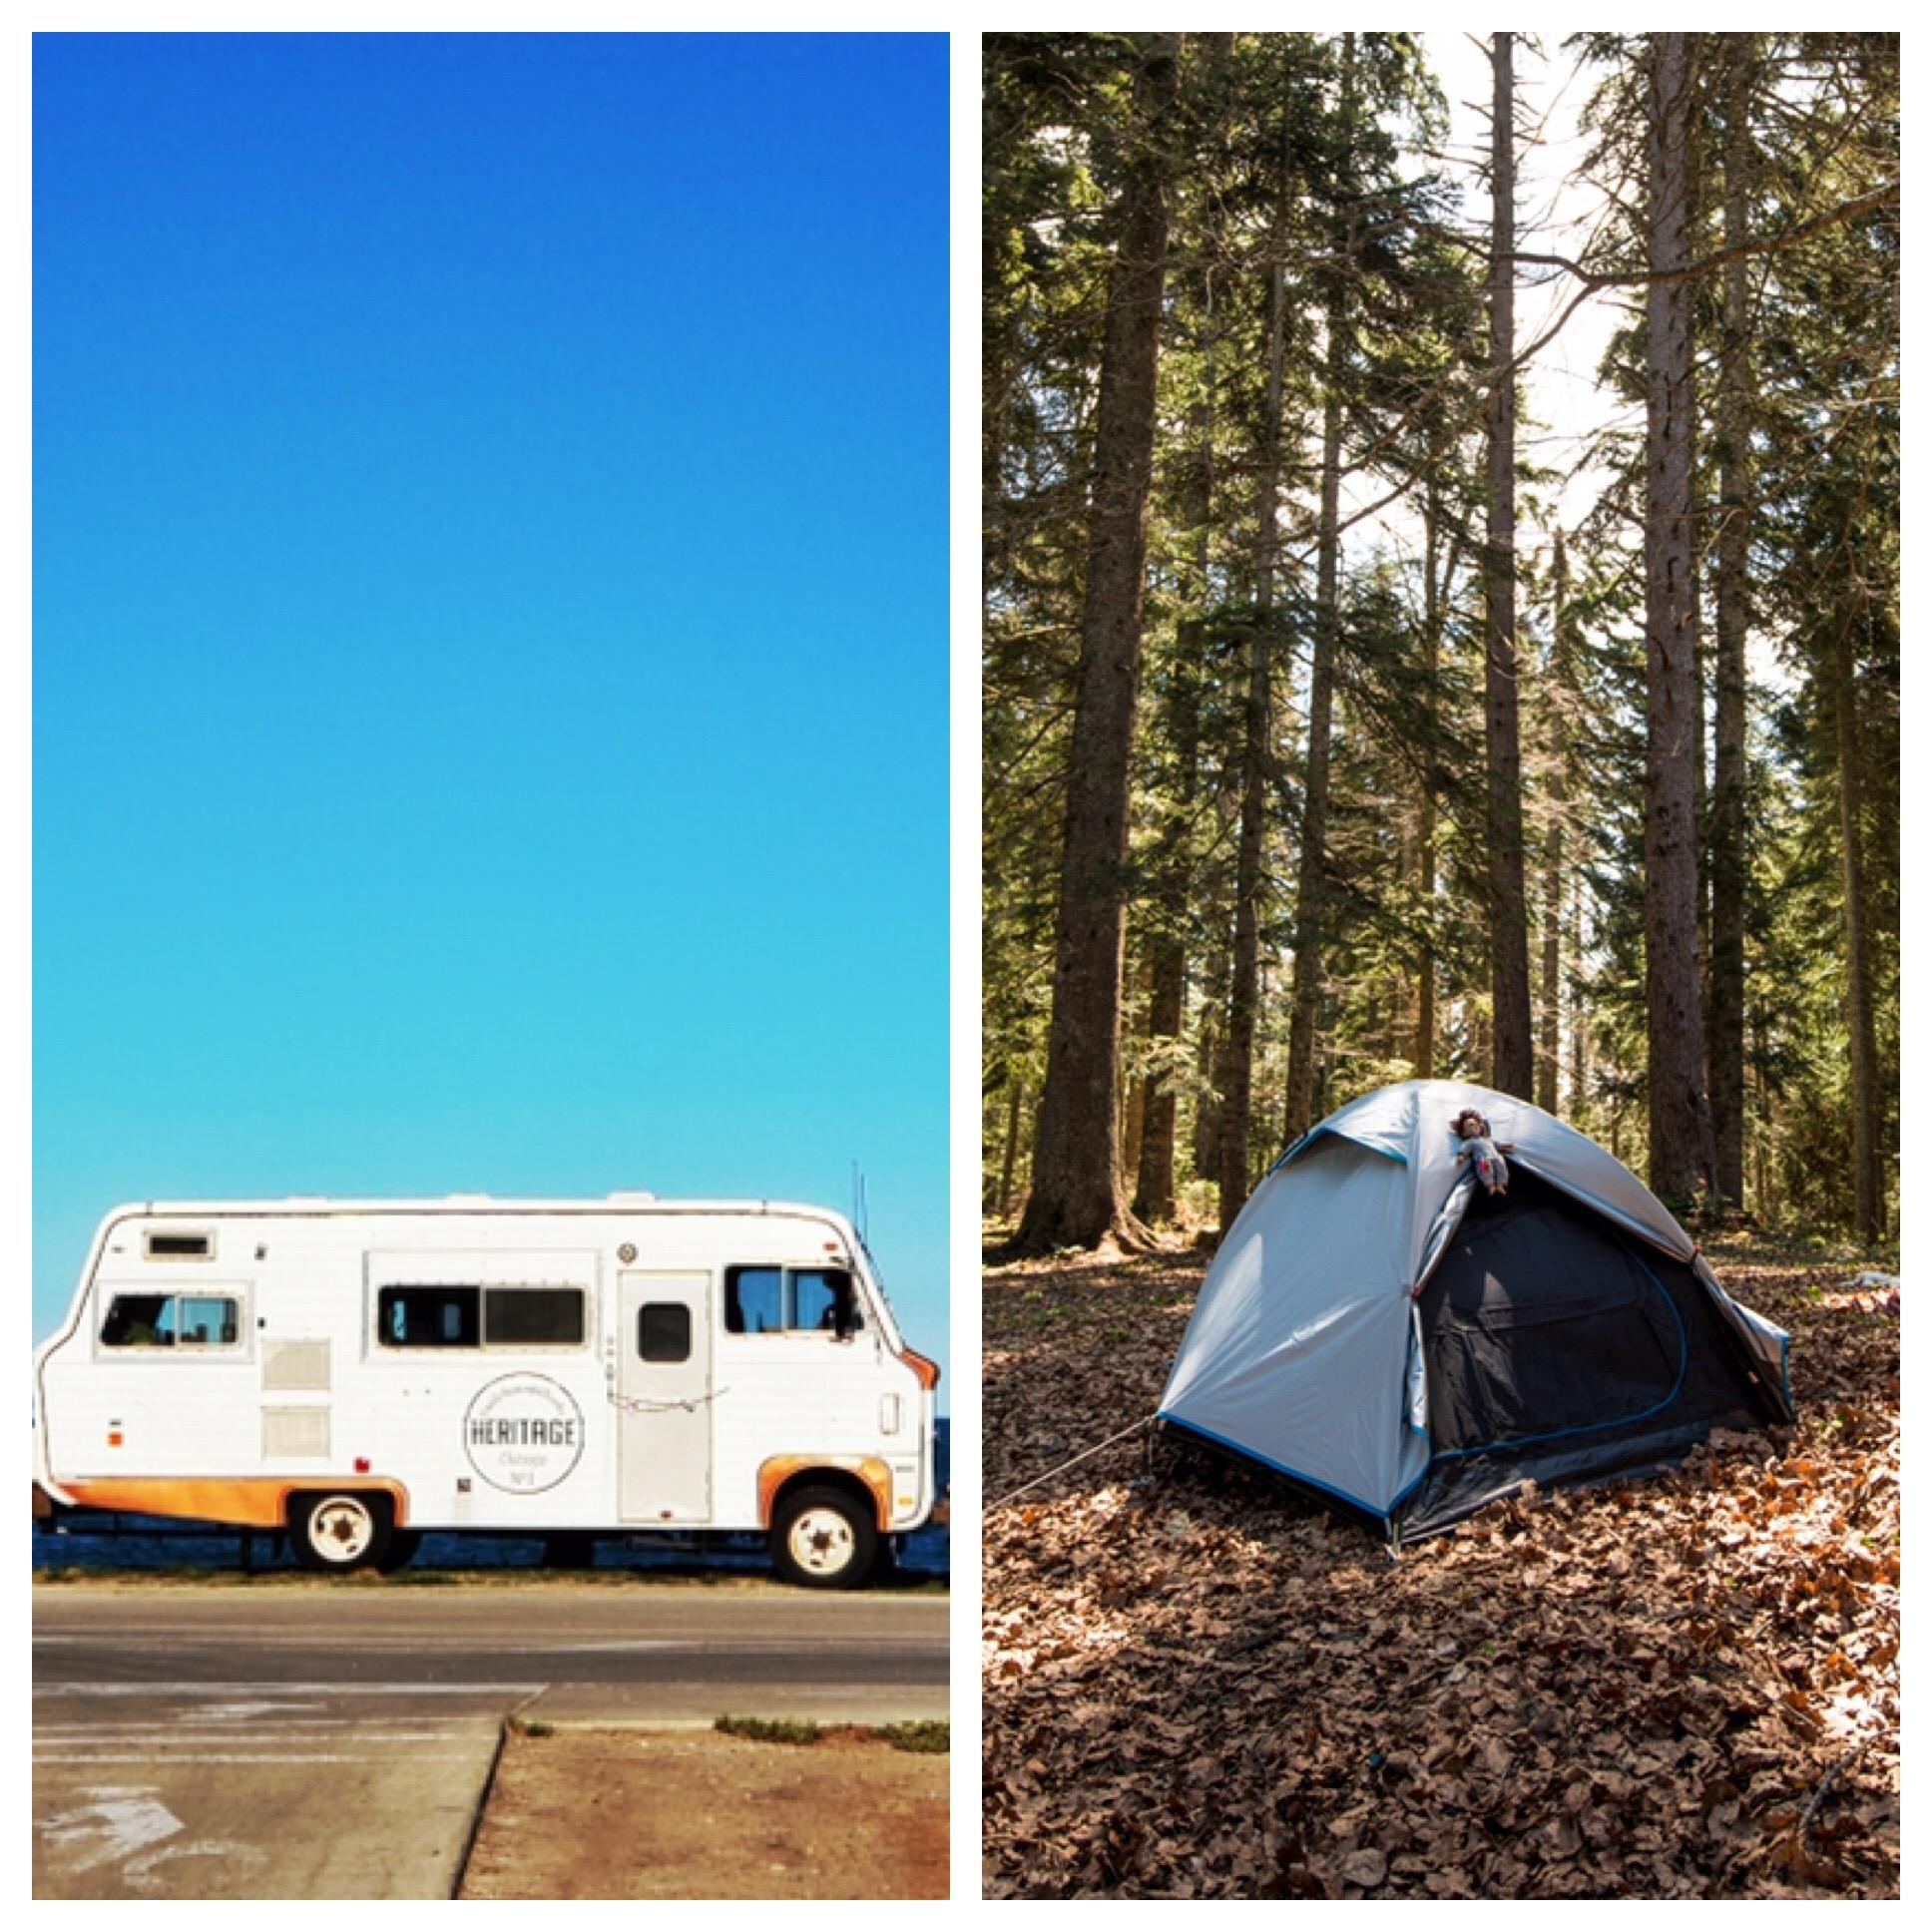 RV vs Tent Camping